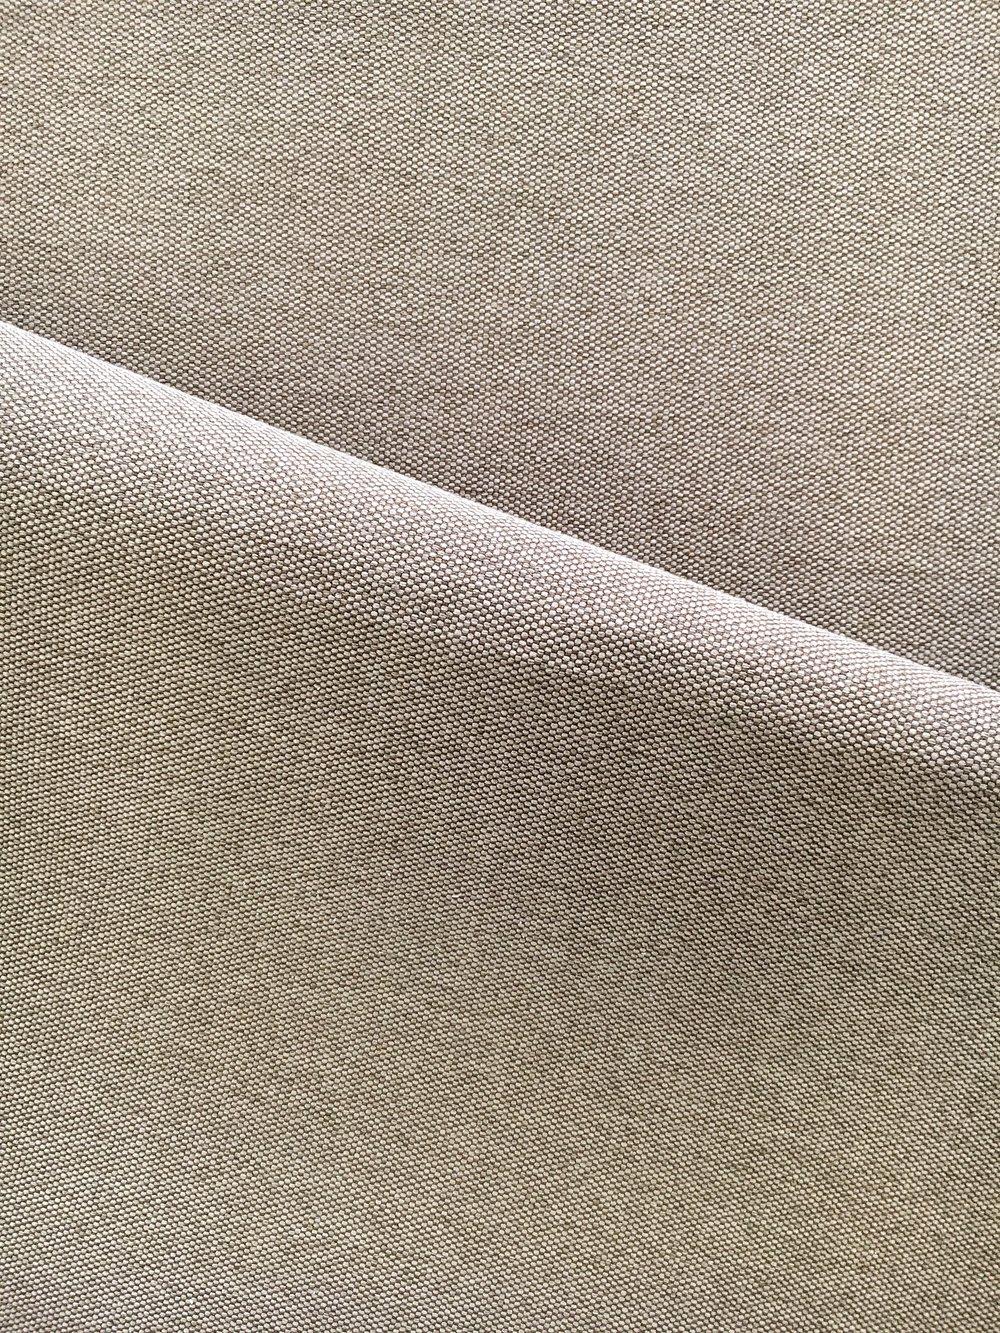 CottonFabricPlain1.jpg